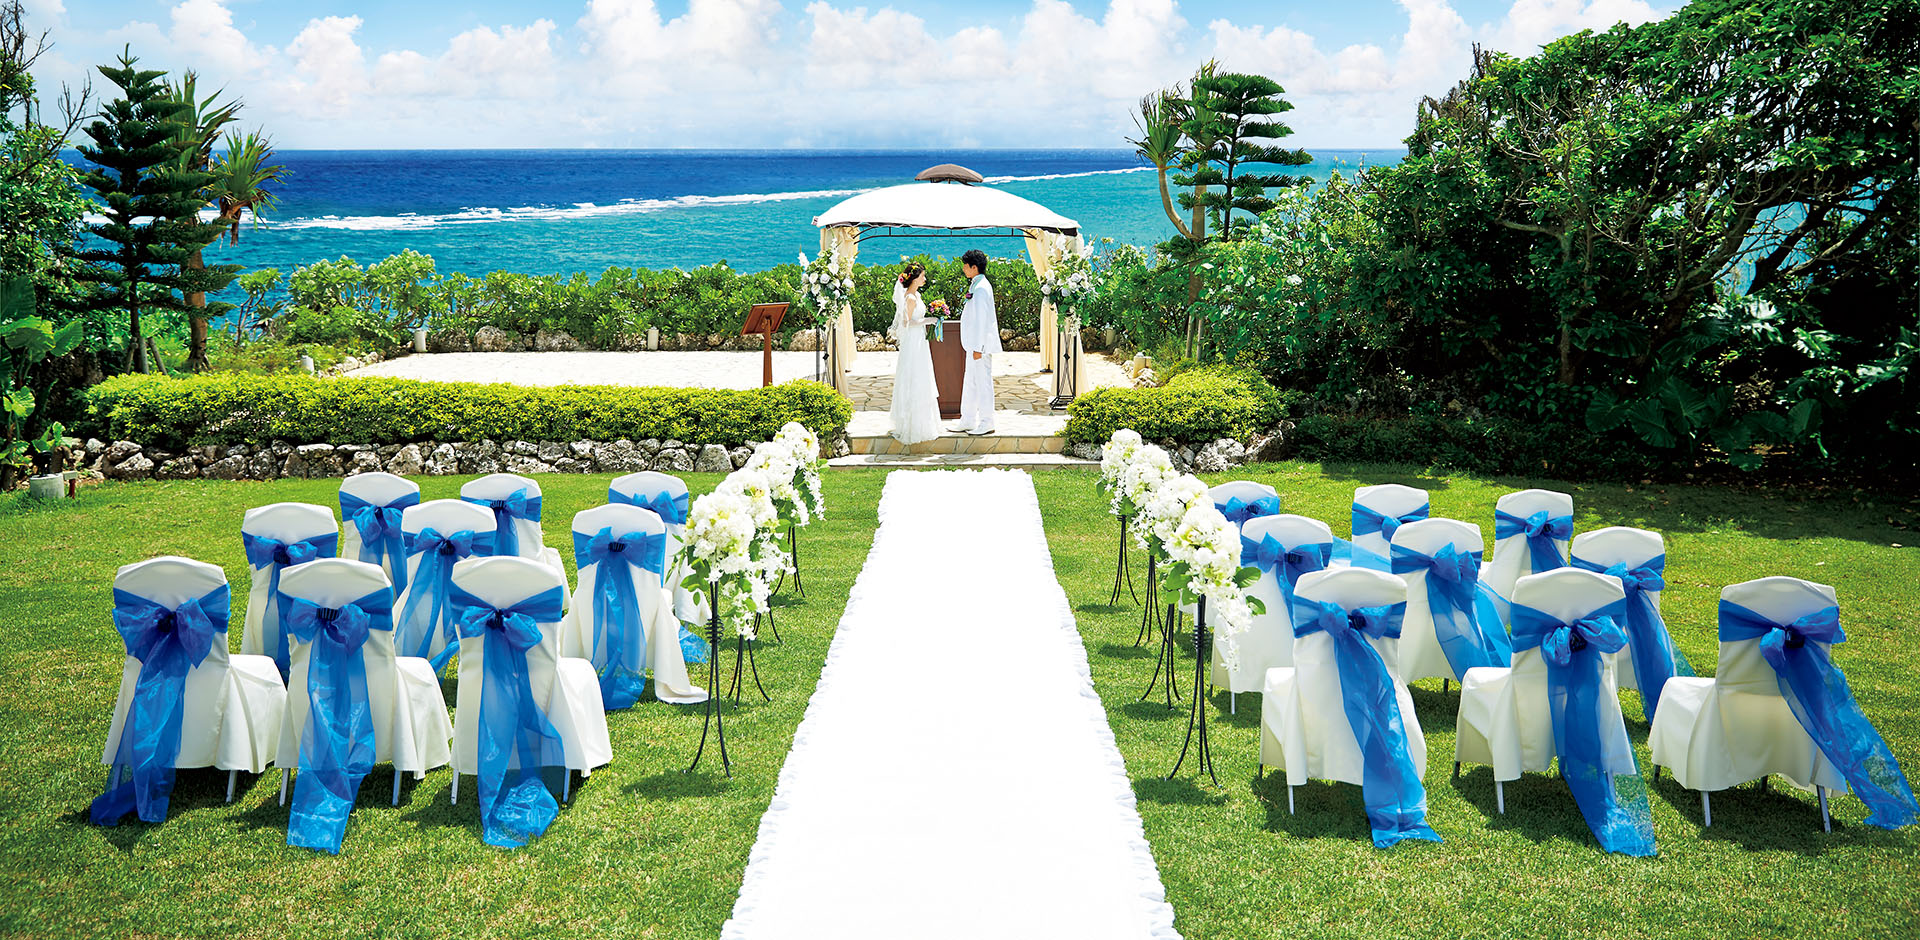 The Shigira Garden Wedding